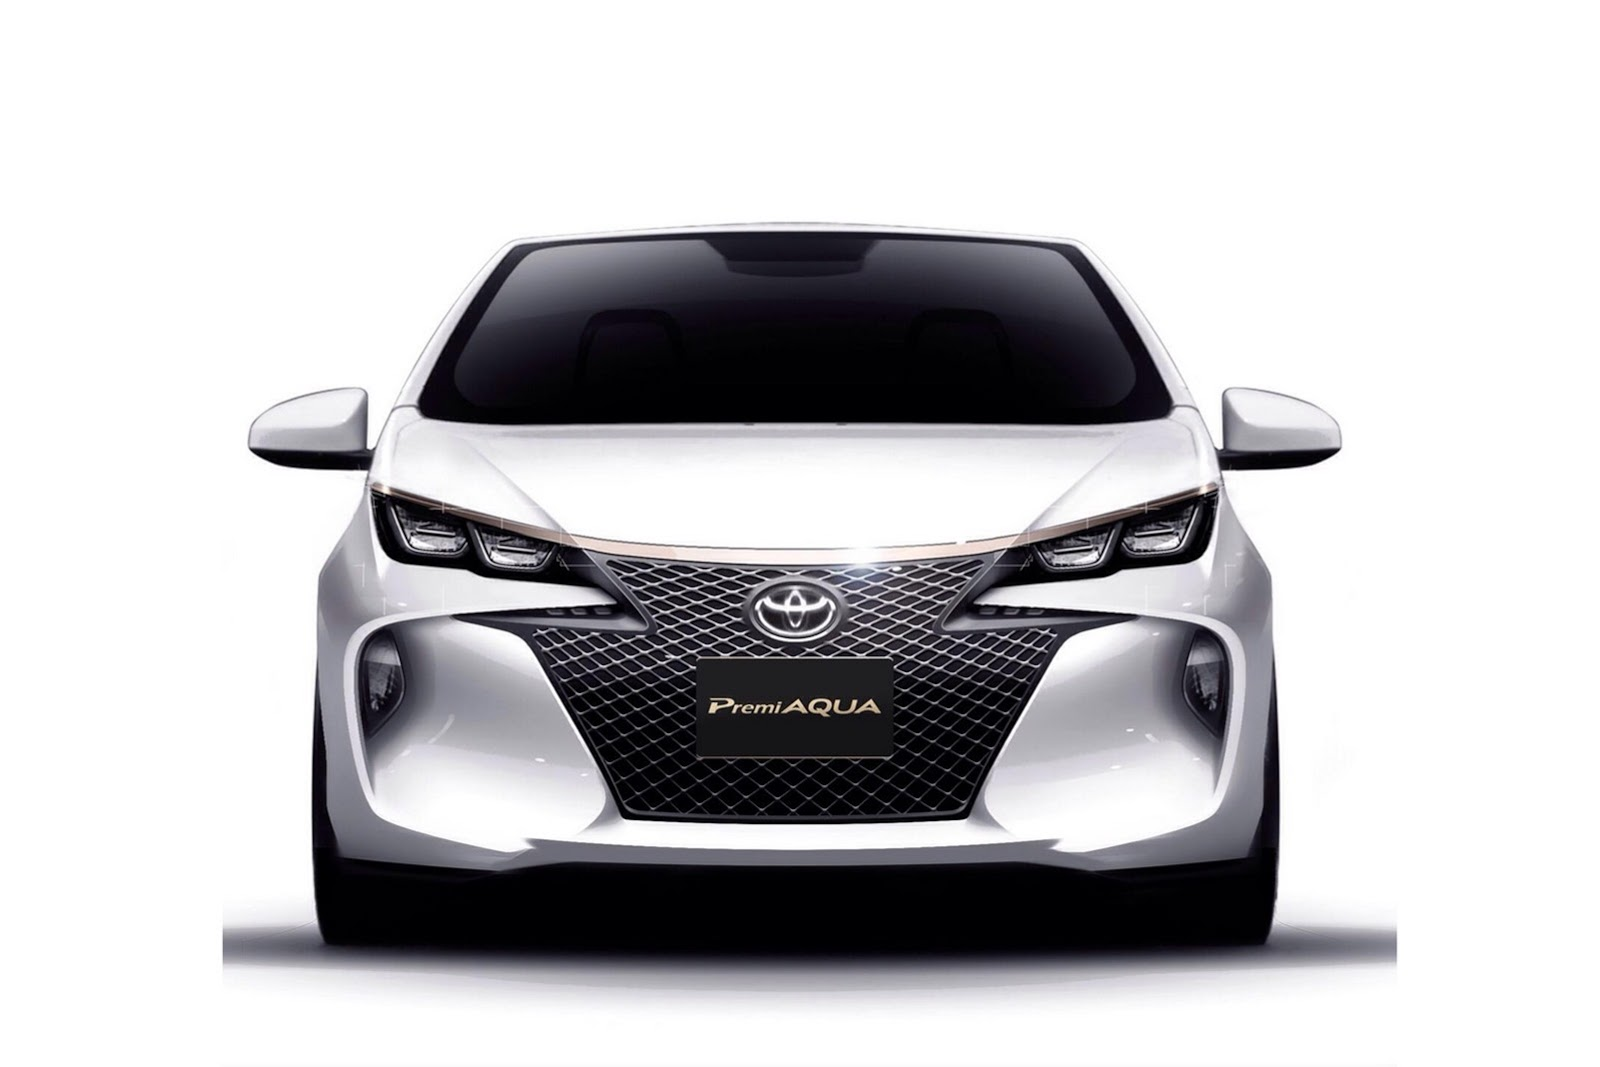 Toyota-Premi-Aqua